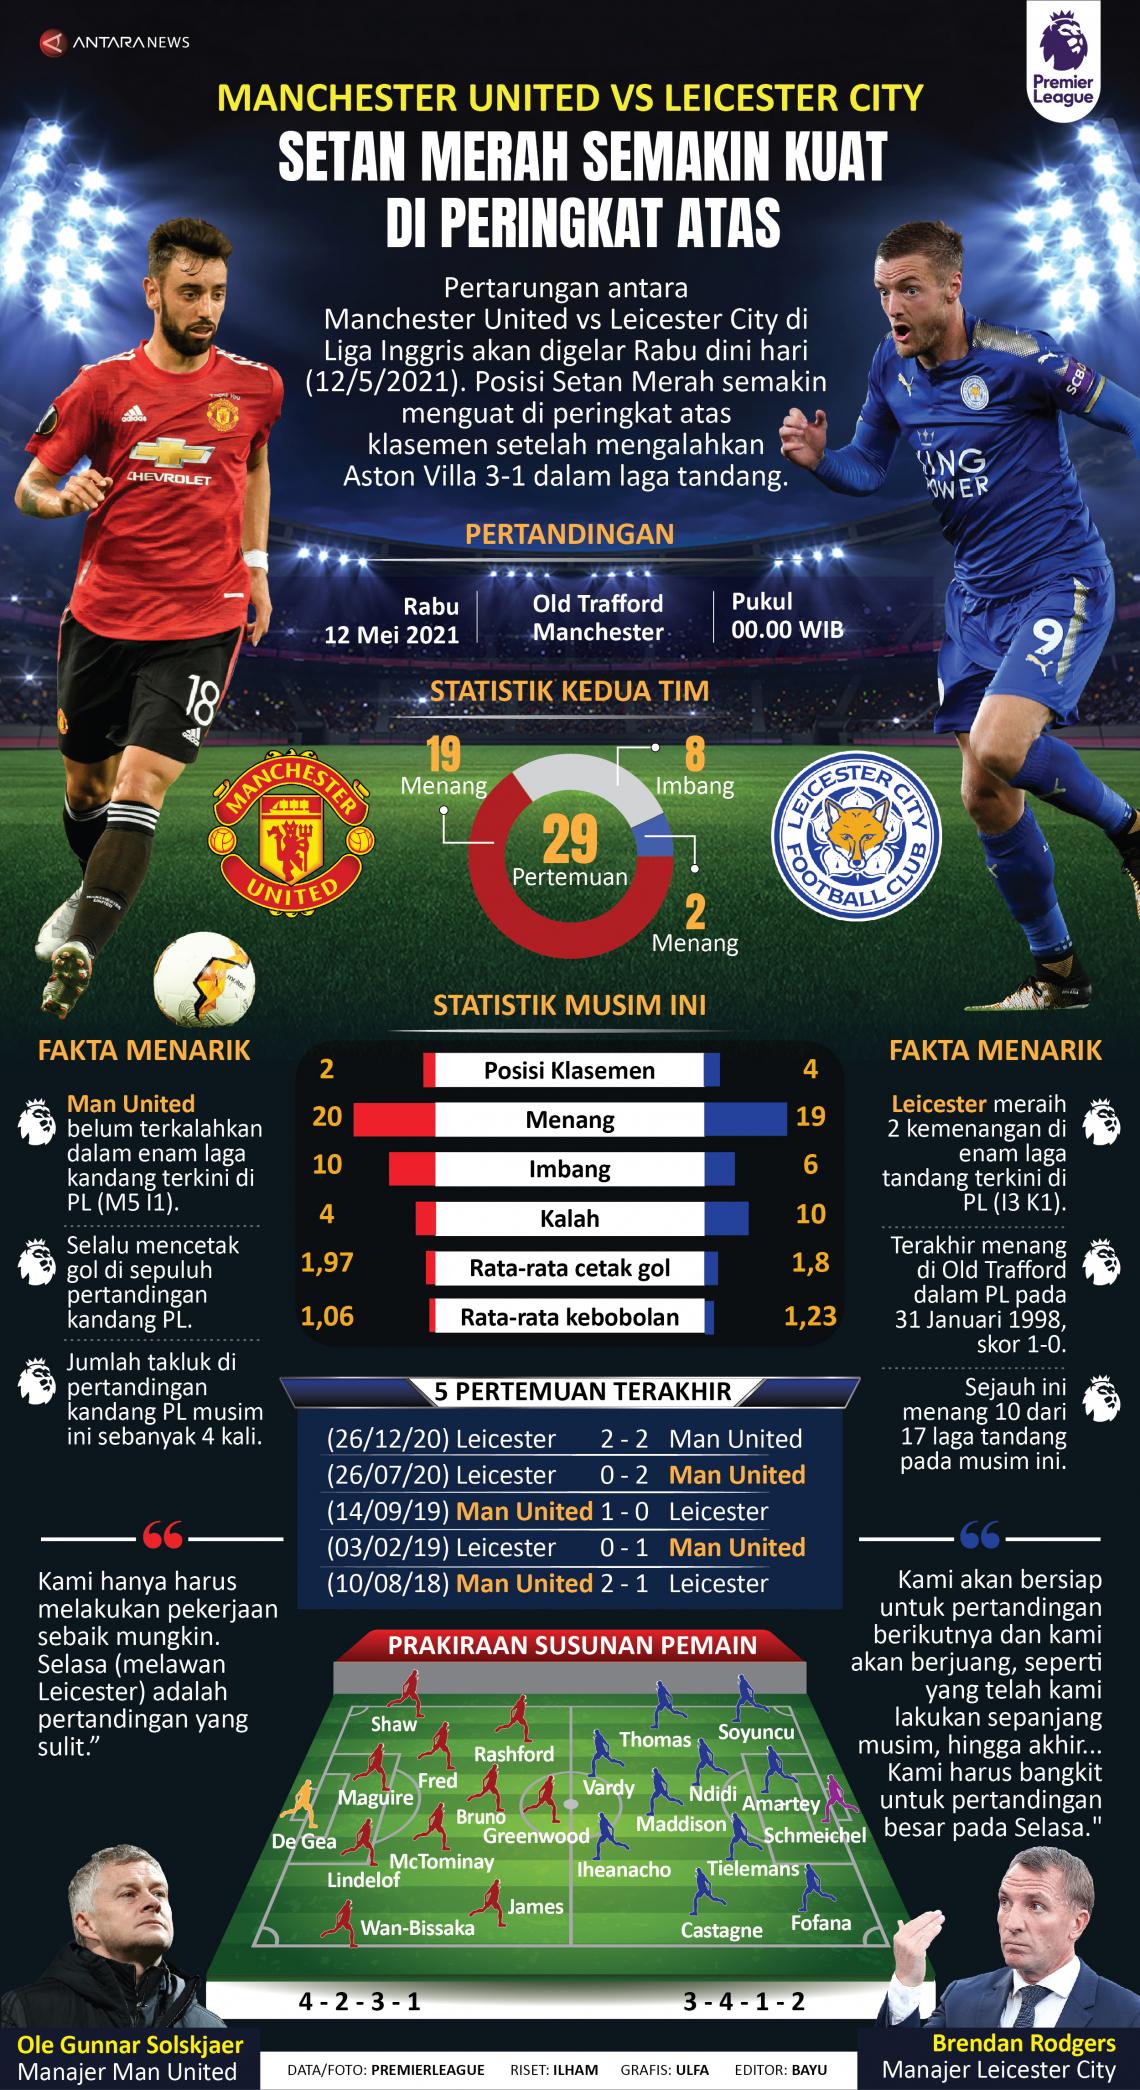 MU vs Leicester City: Setan Merah semakin kuat di peringkat atas